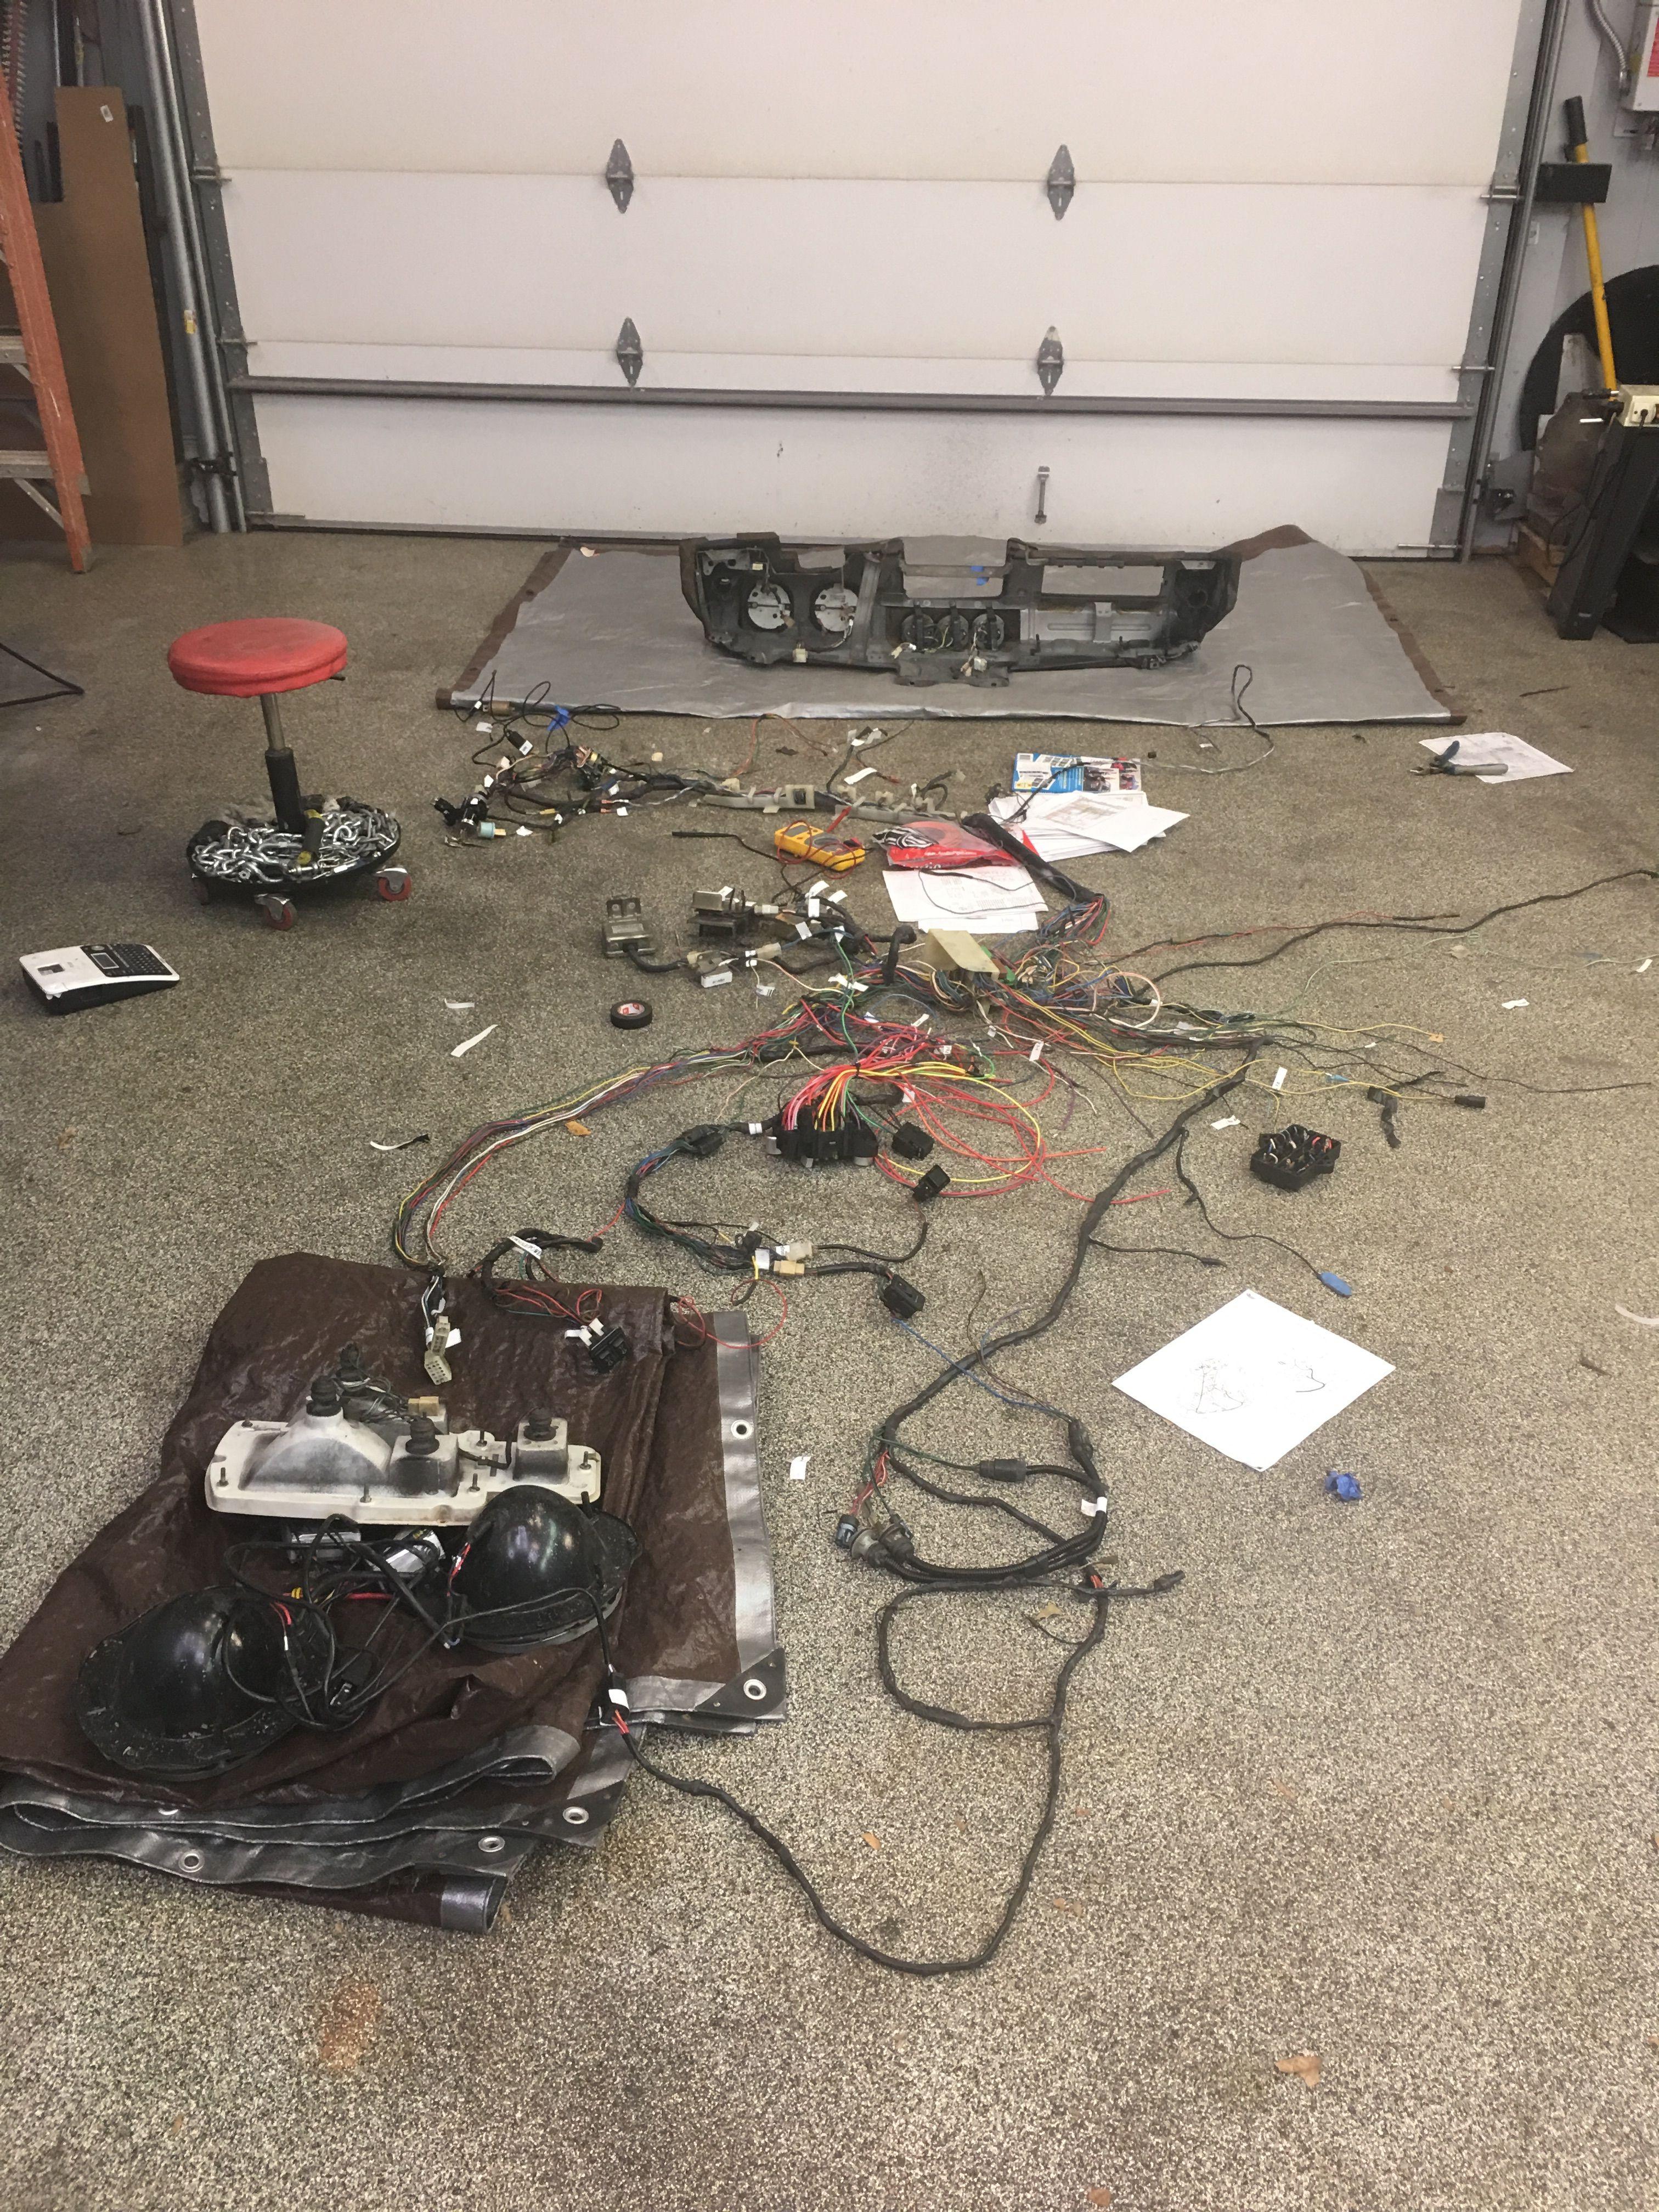 re wiring datsun z with new ez wiring harness [ 3024 x 4032 Pixel ]